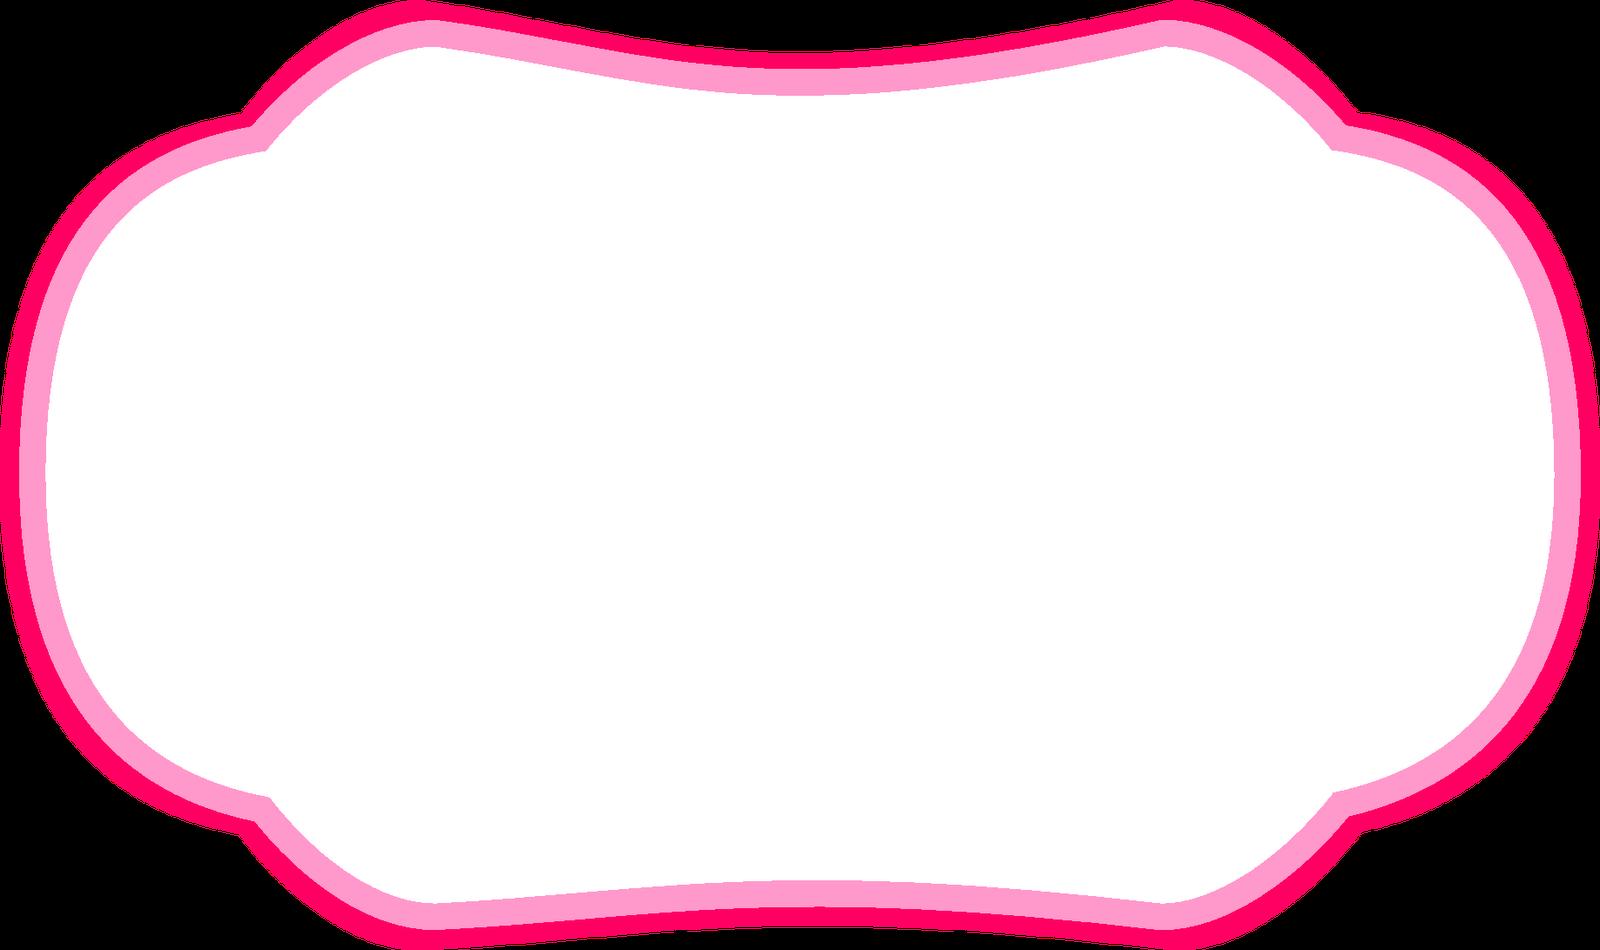 Pink clipart bracket. Frames acessorios para template